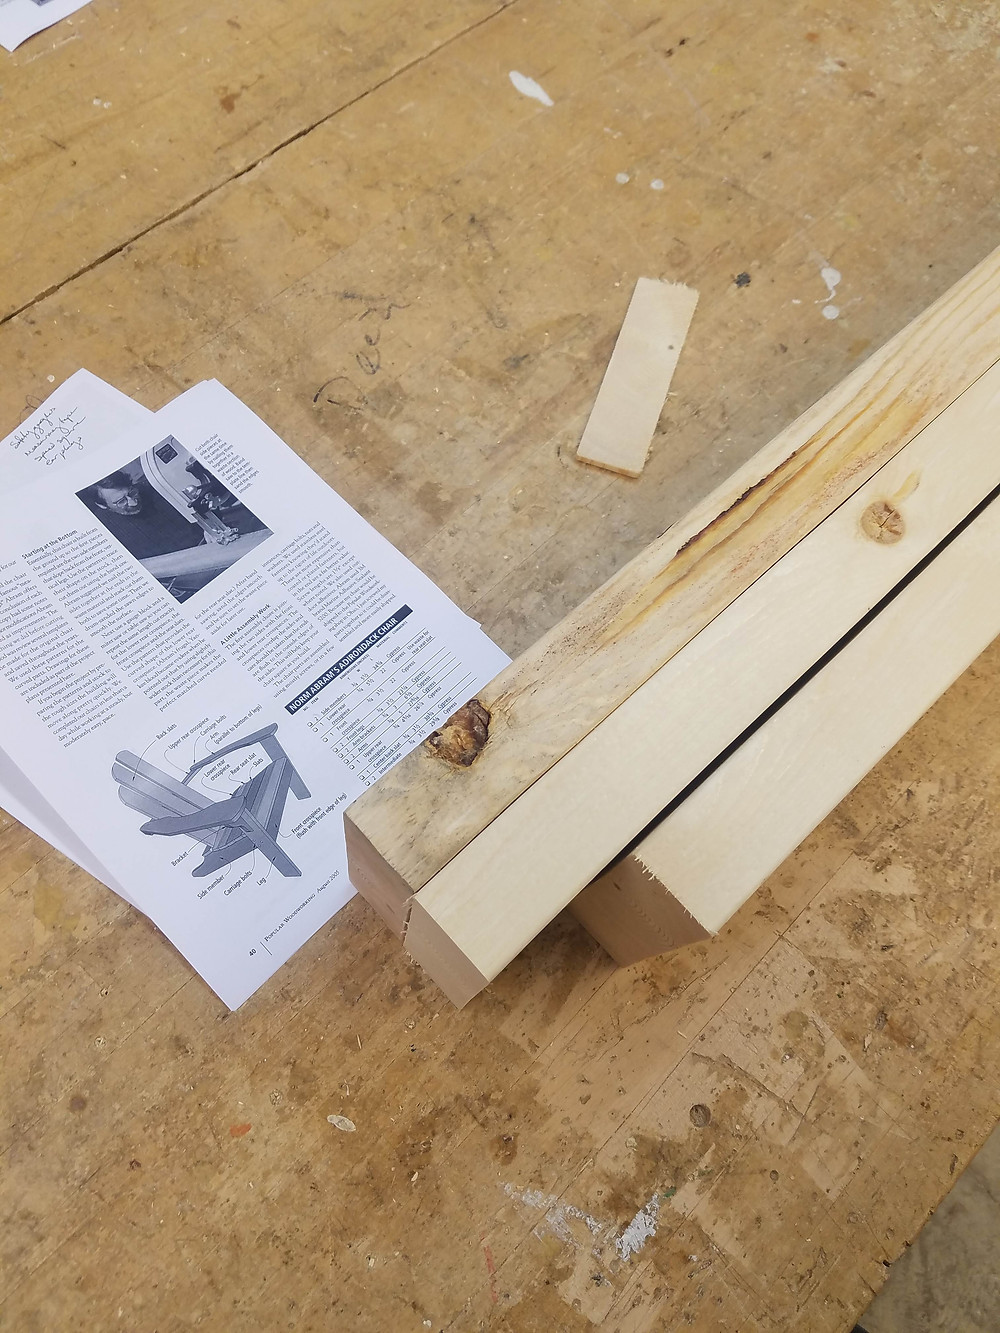 pine, Adirondack chair, blueprints